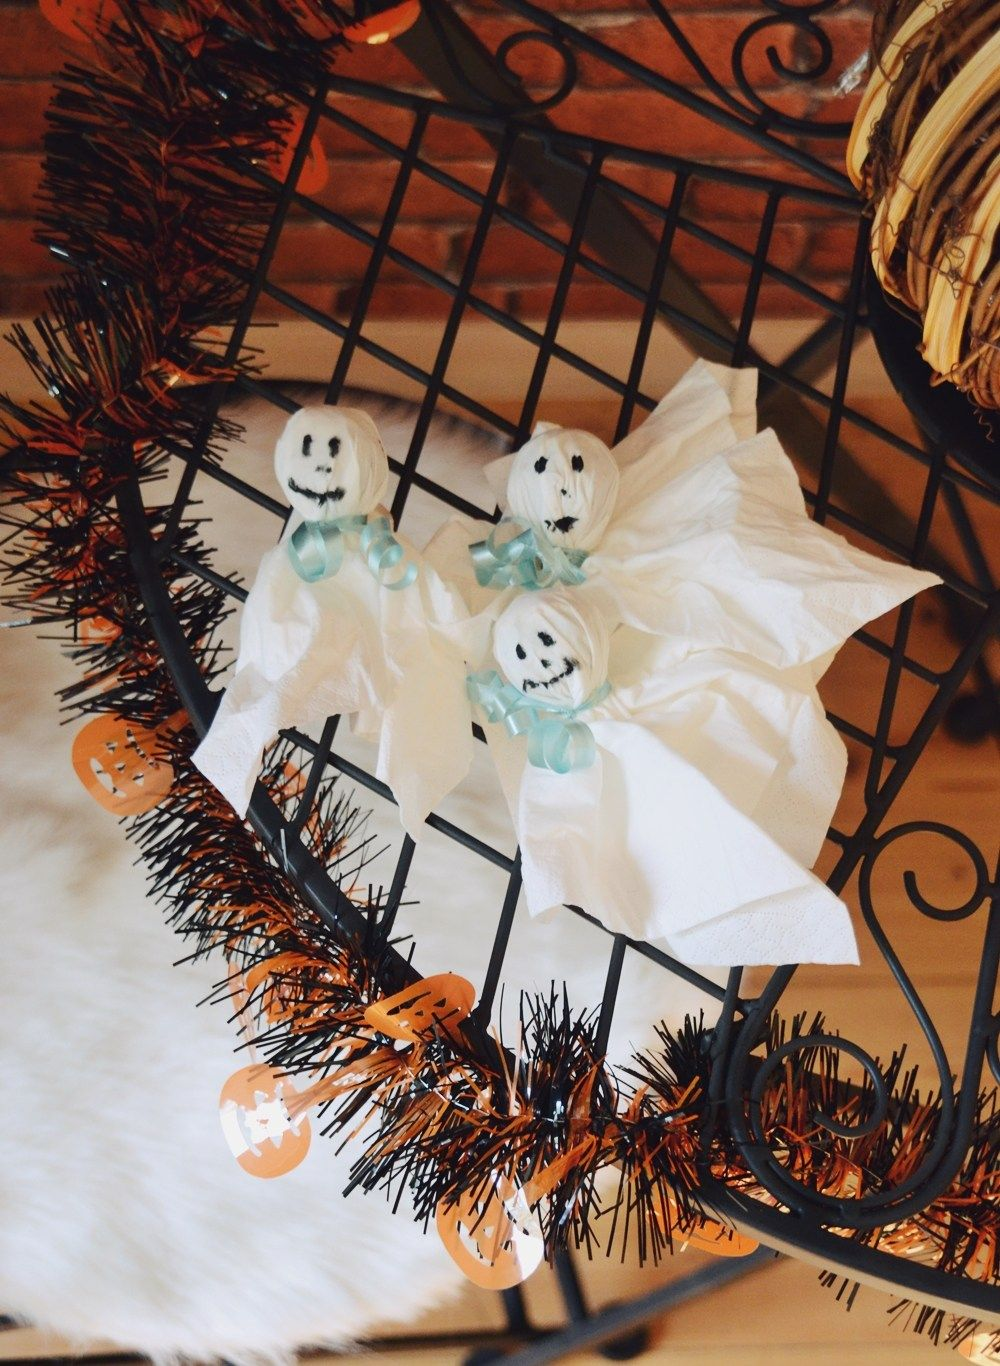 10 Einfache Diy Dekoideen Fur Halloween Julia To The Fullest Halloween Selber Machen Halloween Party Deko Selber Machen Party Deko Selber Machen